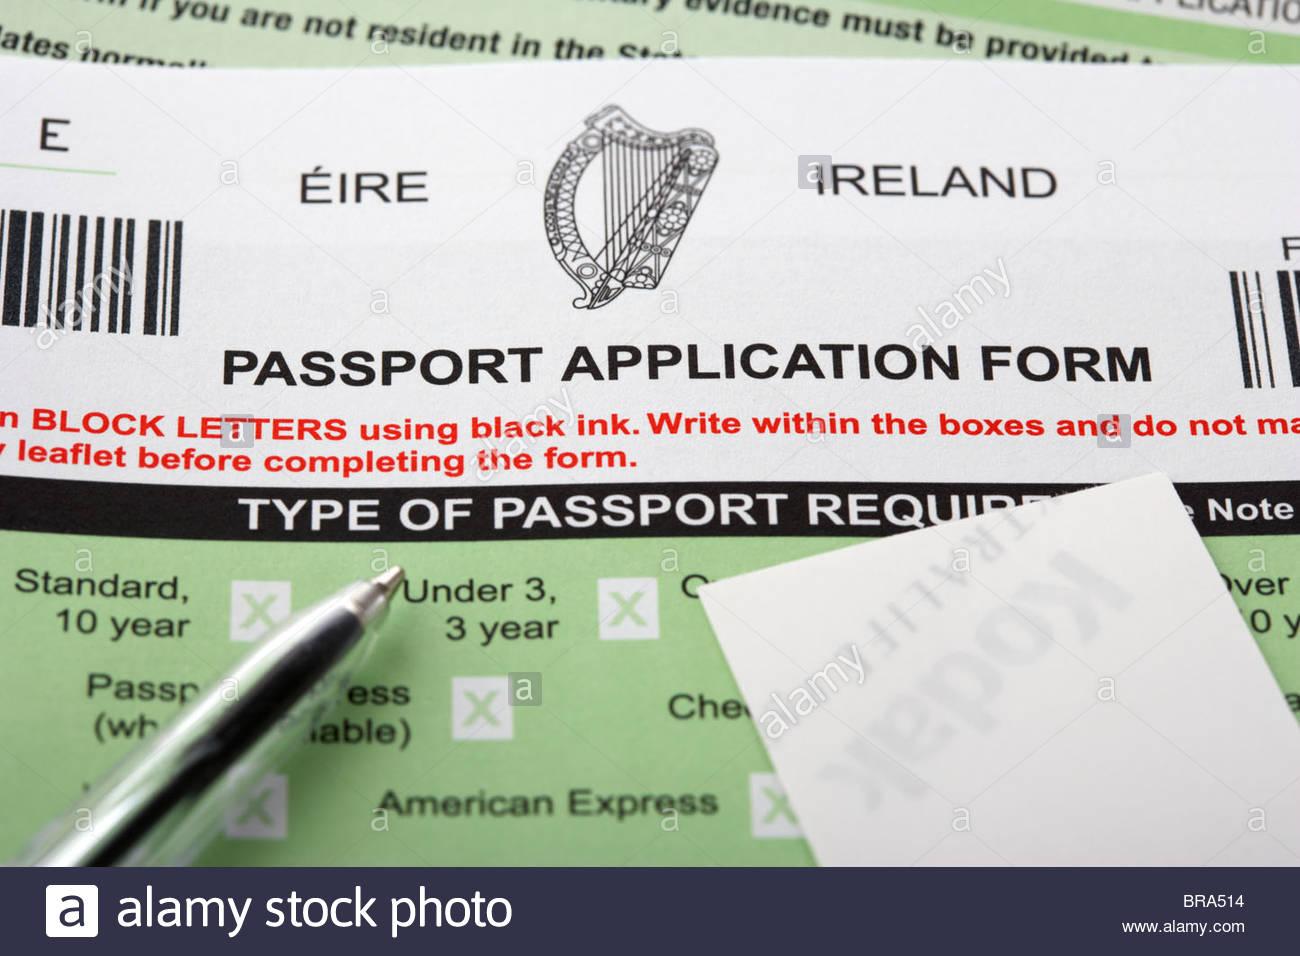 Irish Passport Application Form Stock Photo 31570928 Alamy